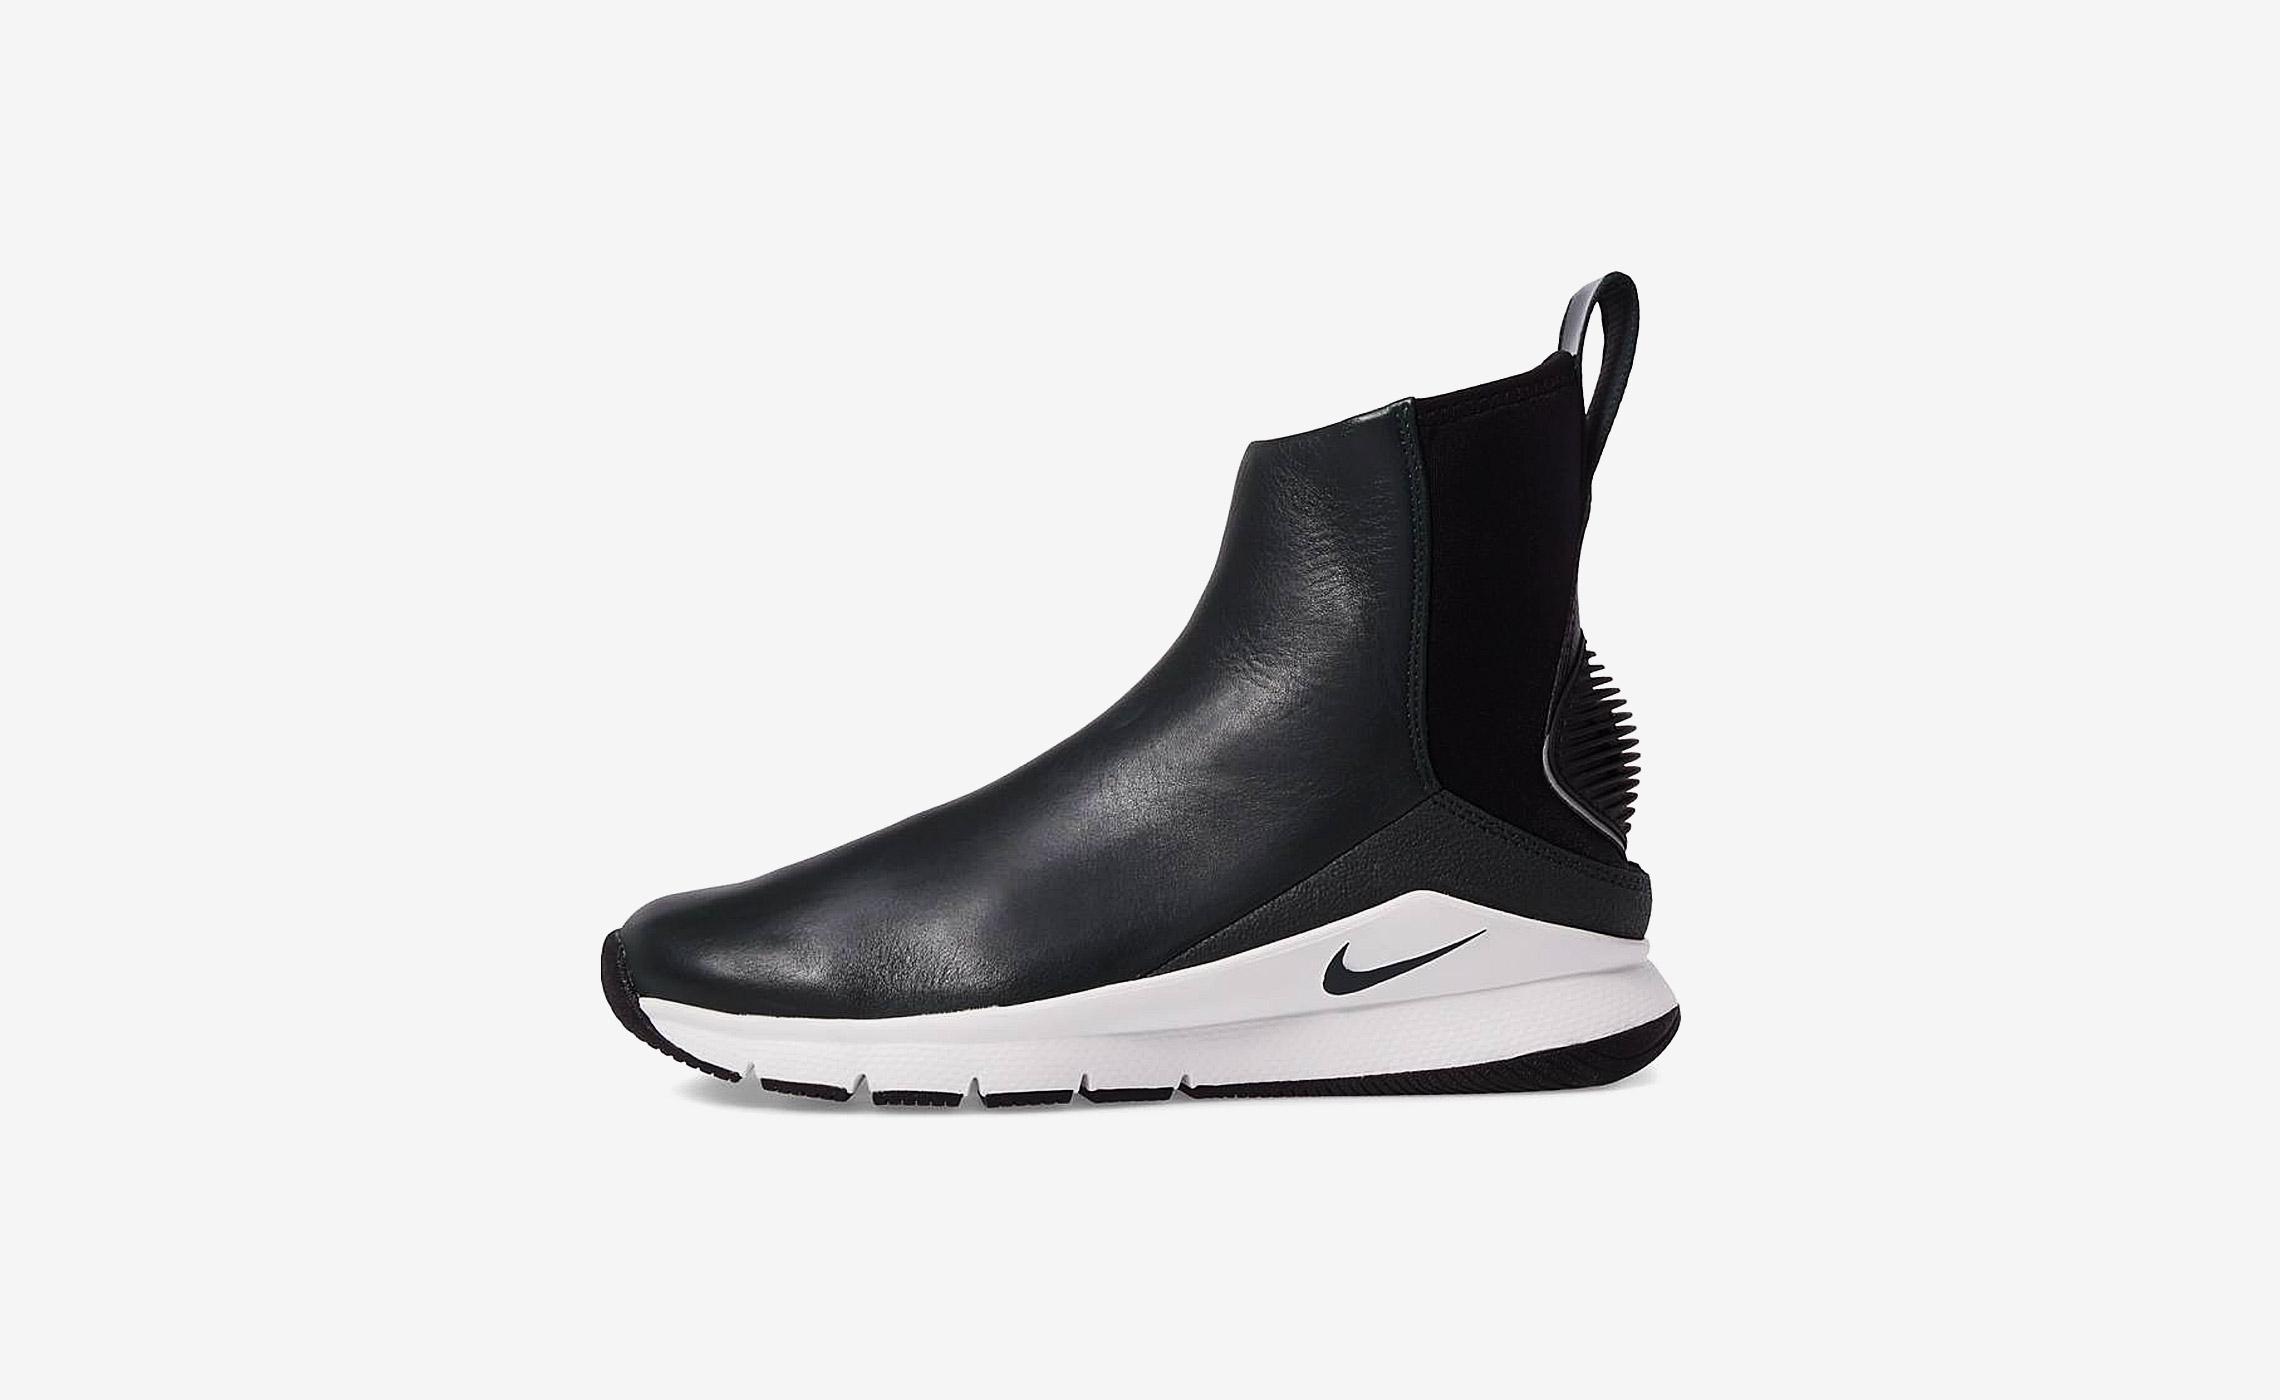 watch 40f55 7b8dd ... Womens Nike Rivah High Premium Waterproof Sneaker Boot - Eve ...